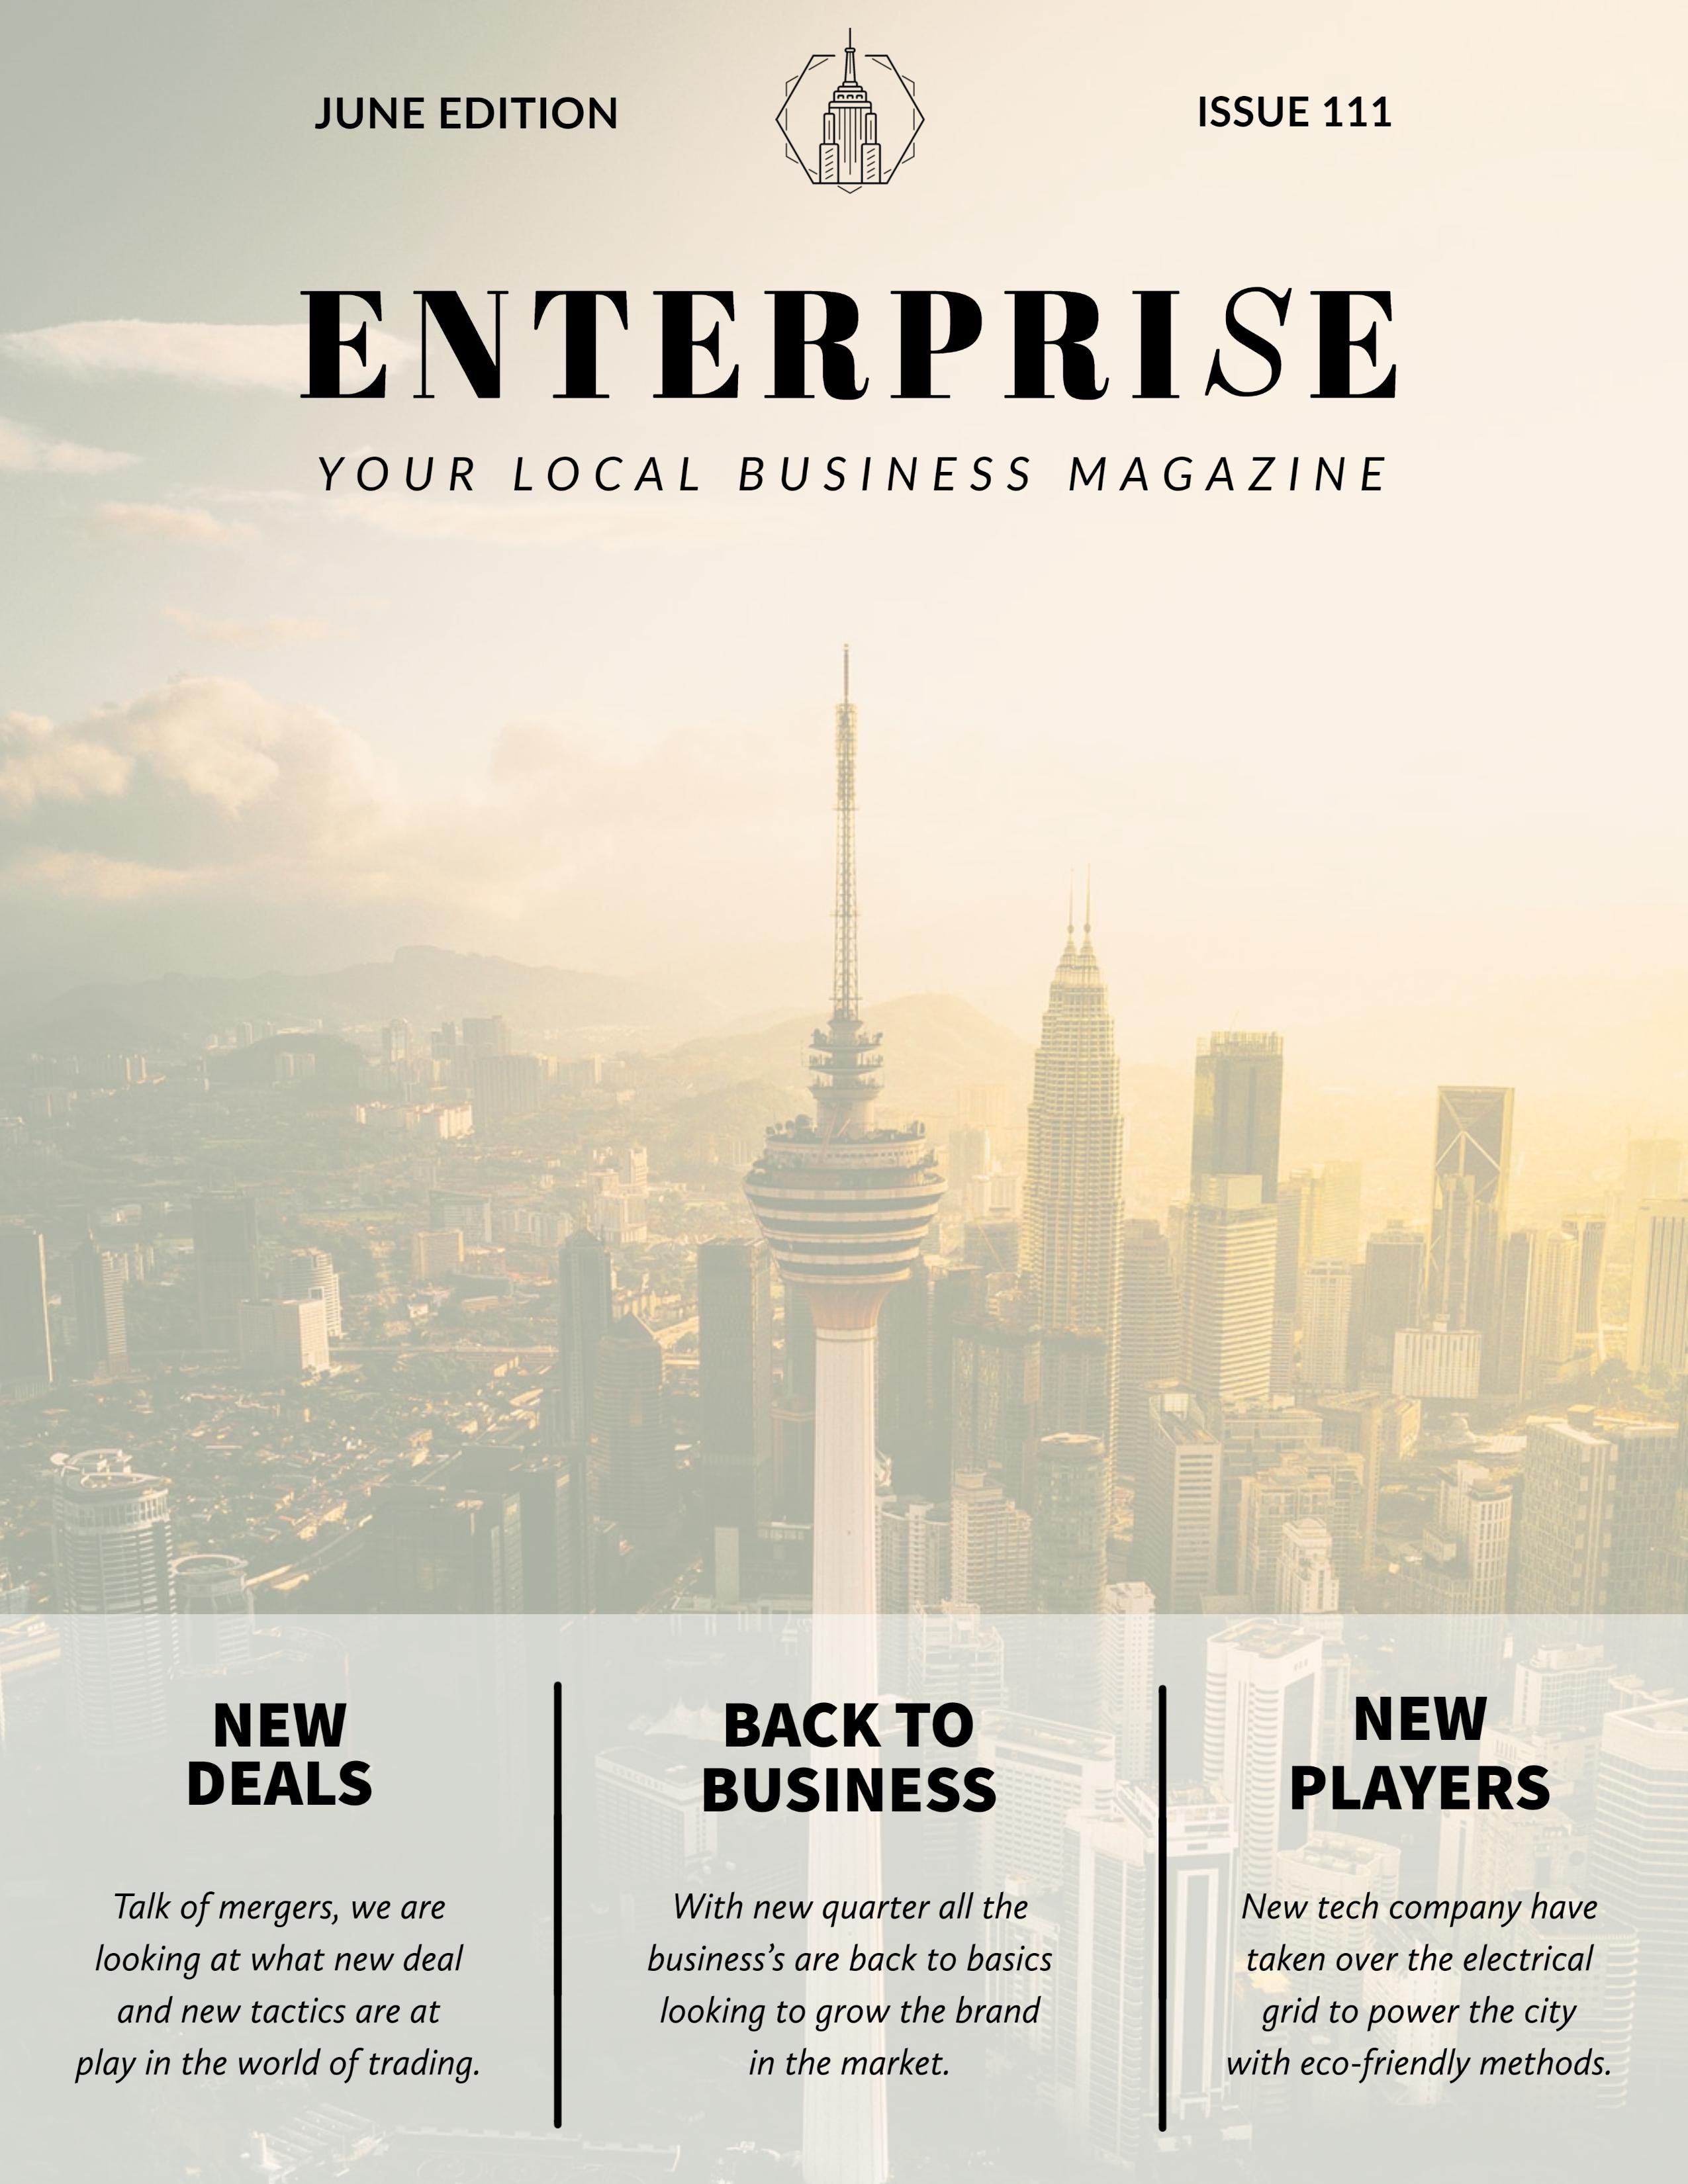 Business Magazine Cover Design Inspirations Cover Design Inspiration Magazine Cover Cover Design